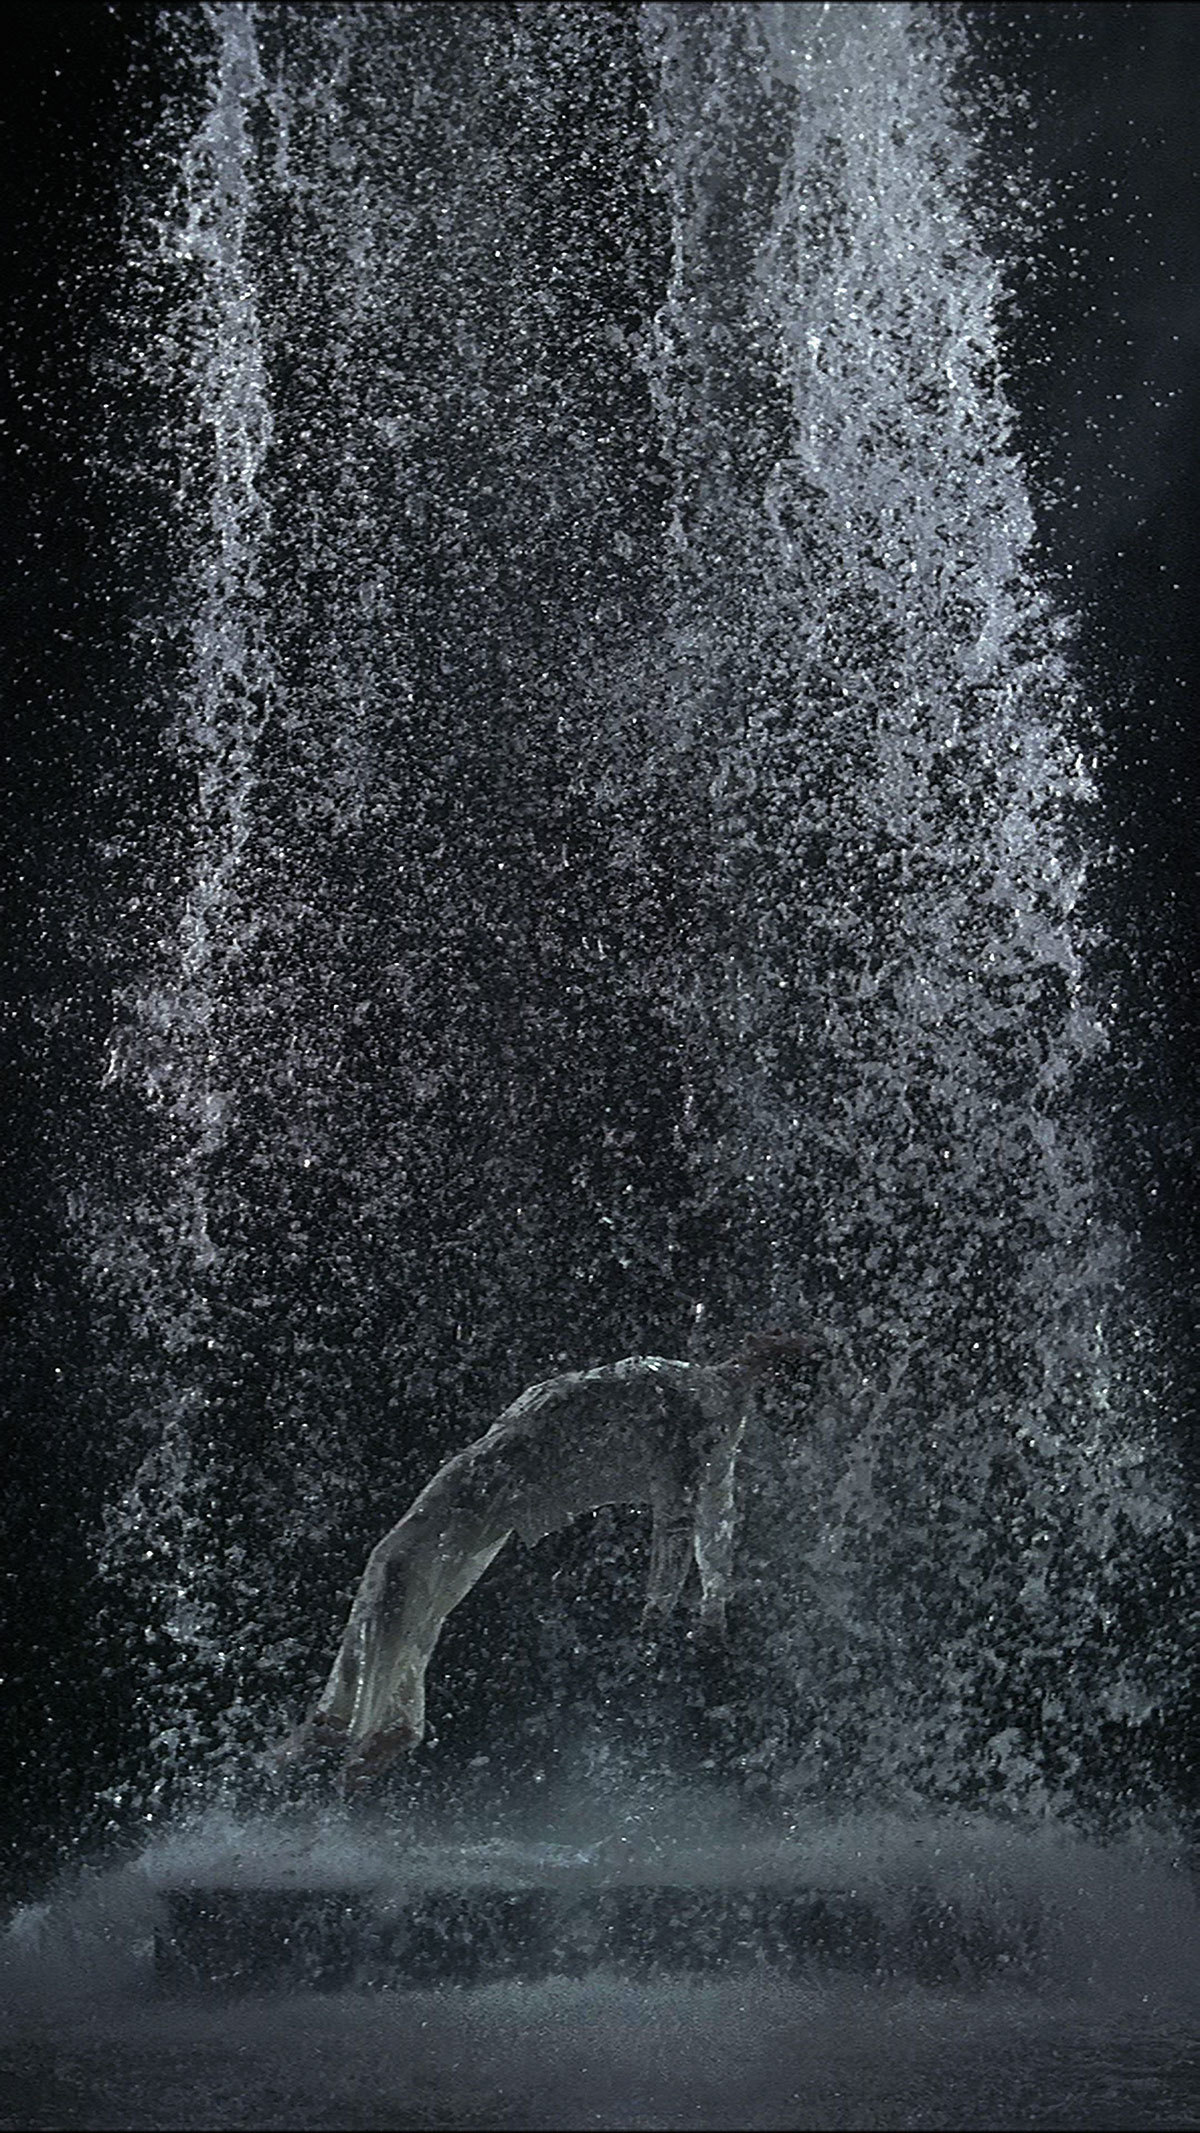 Tristan's Ascension by Bill Viola